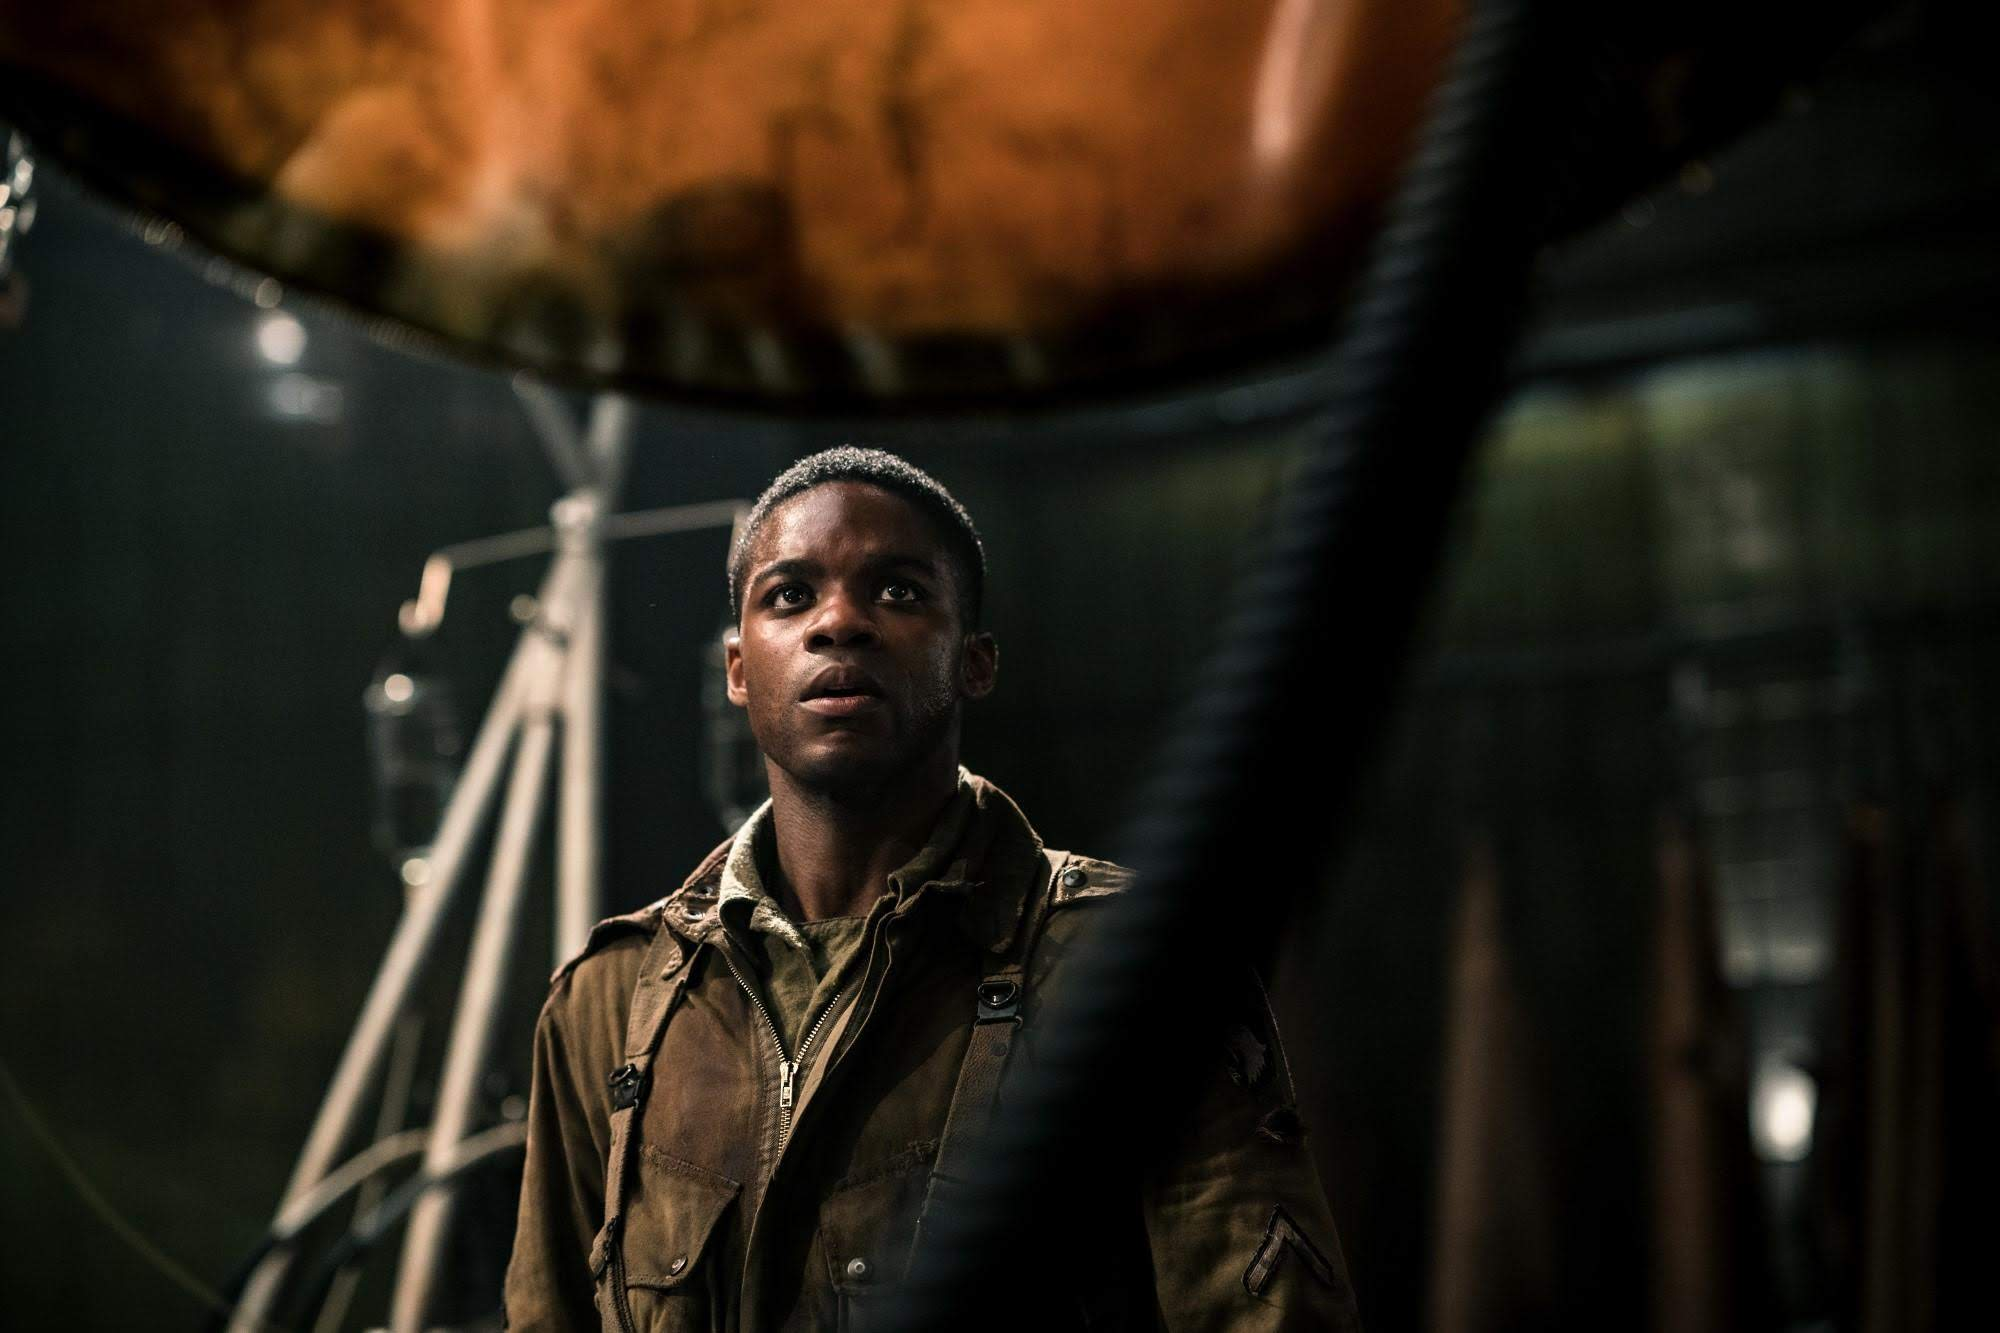 Box Office : 11月9日~11日の全米映画ボックスオフィスTOP5 - J・J・エイブラムス監督がプロデュースの戦争ホラー・アクション「オーバーロード」が、評論家とホラー・オタクからは共に絶賛の高評価を博すも、マニアック過ぎたネタが一般の観客にはウケず、期待値を下まわったガッカリの初登場第3位 ! !